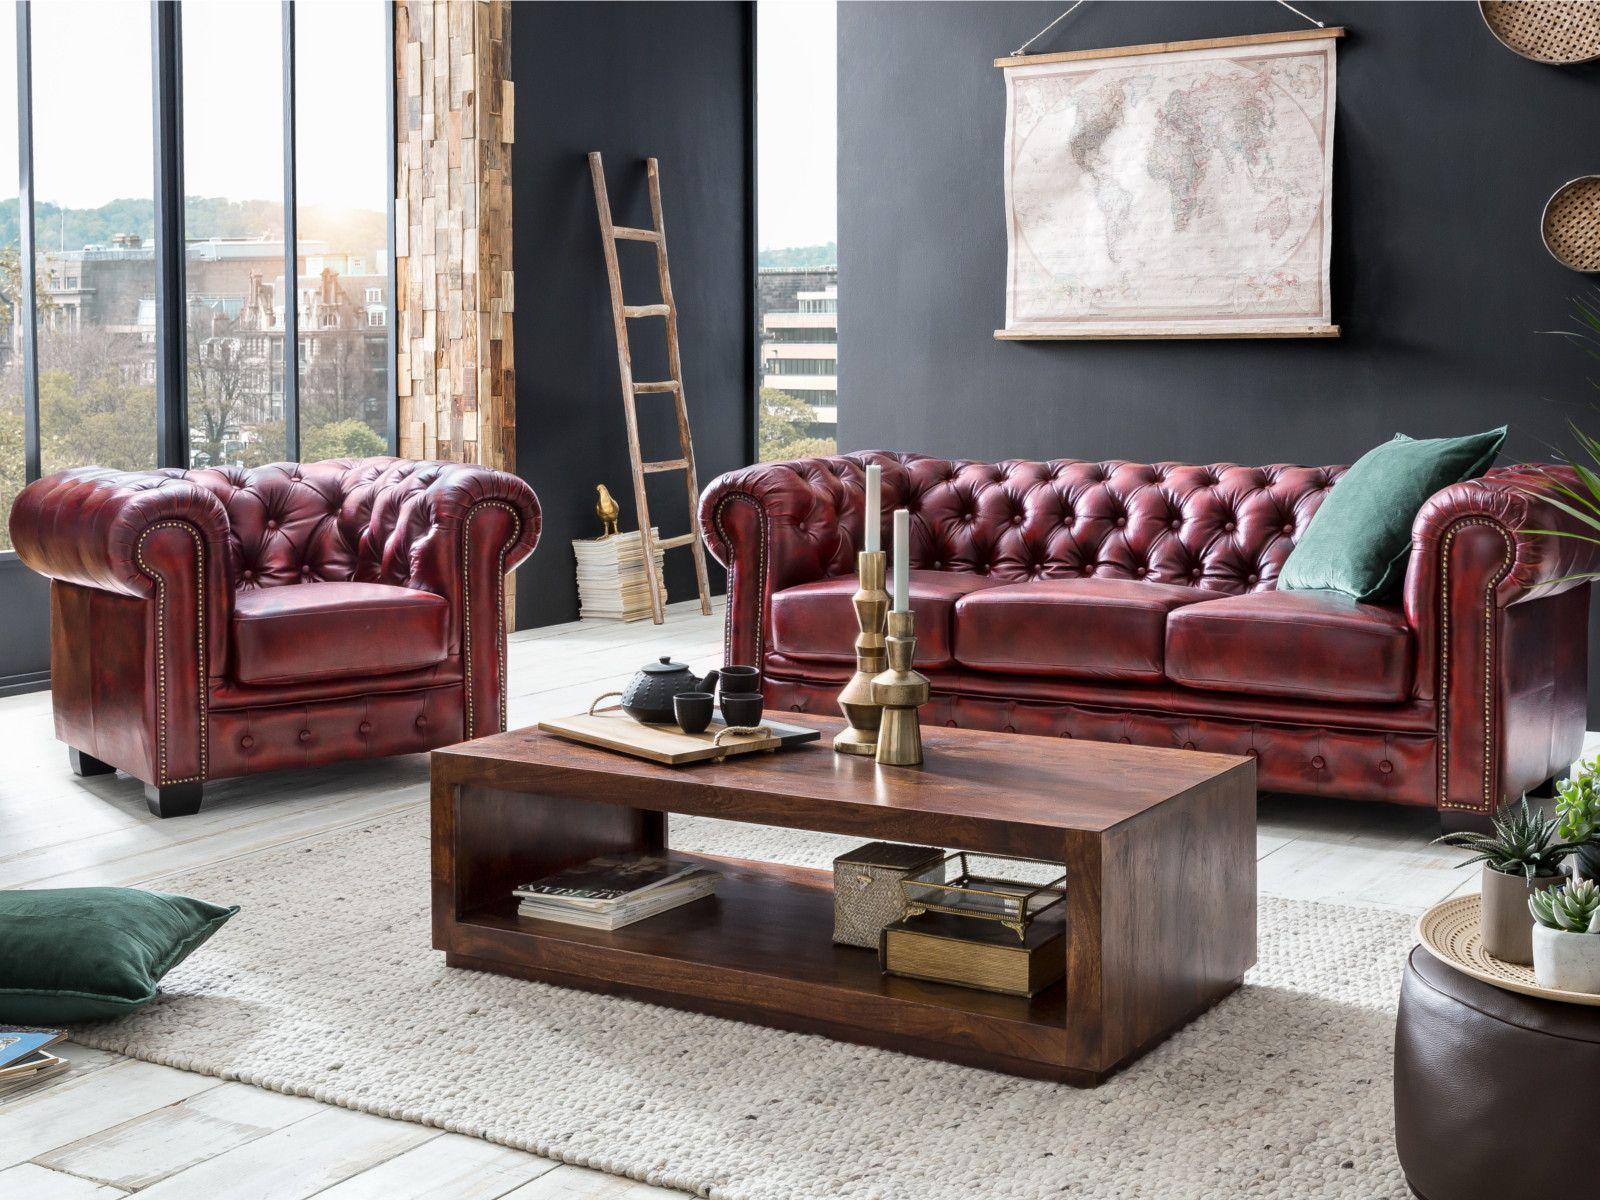 Chesterfield Sofa Garnitur Rot  Chesterfield sofa, Sofa sessel, Sofa